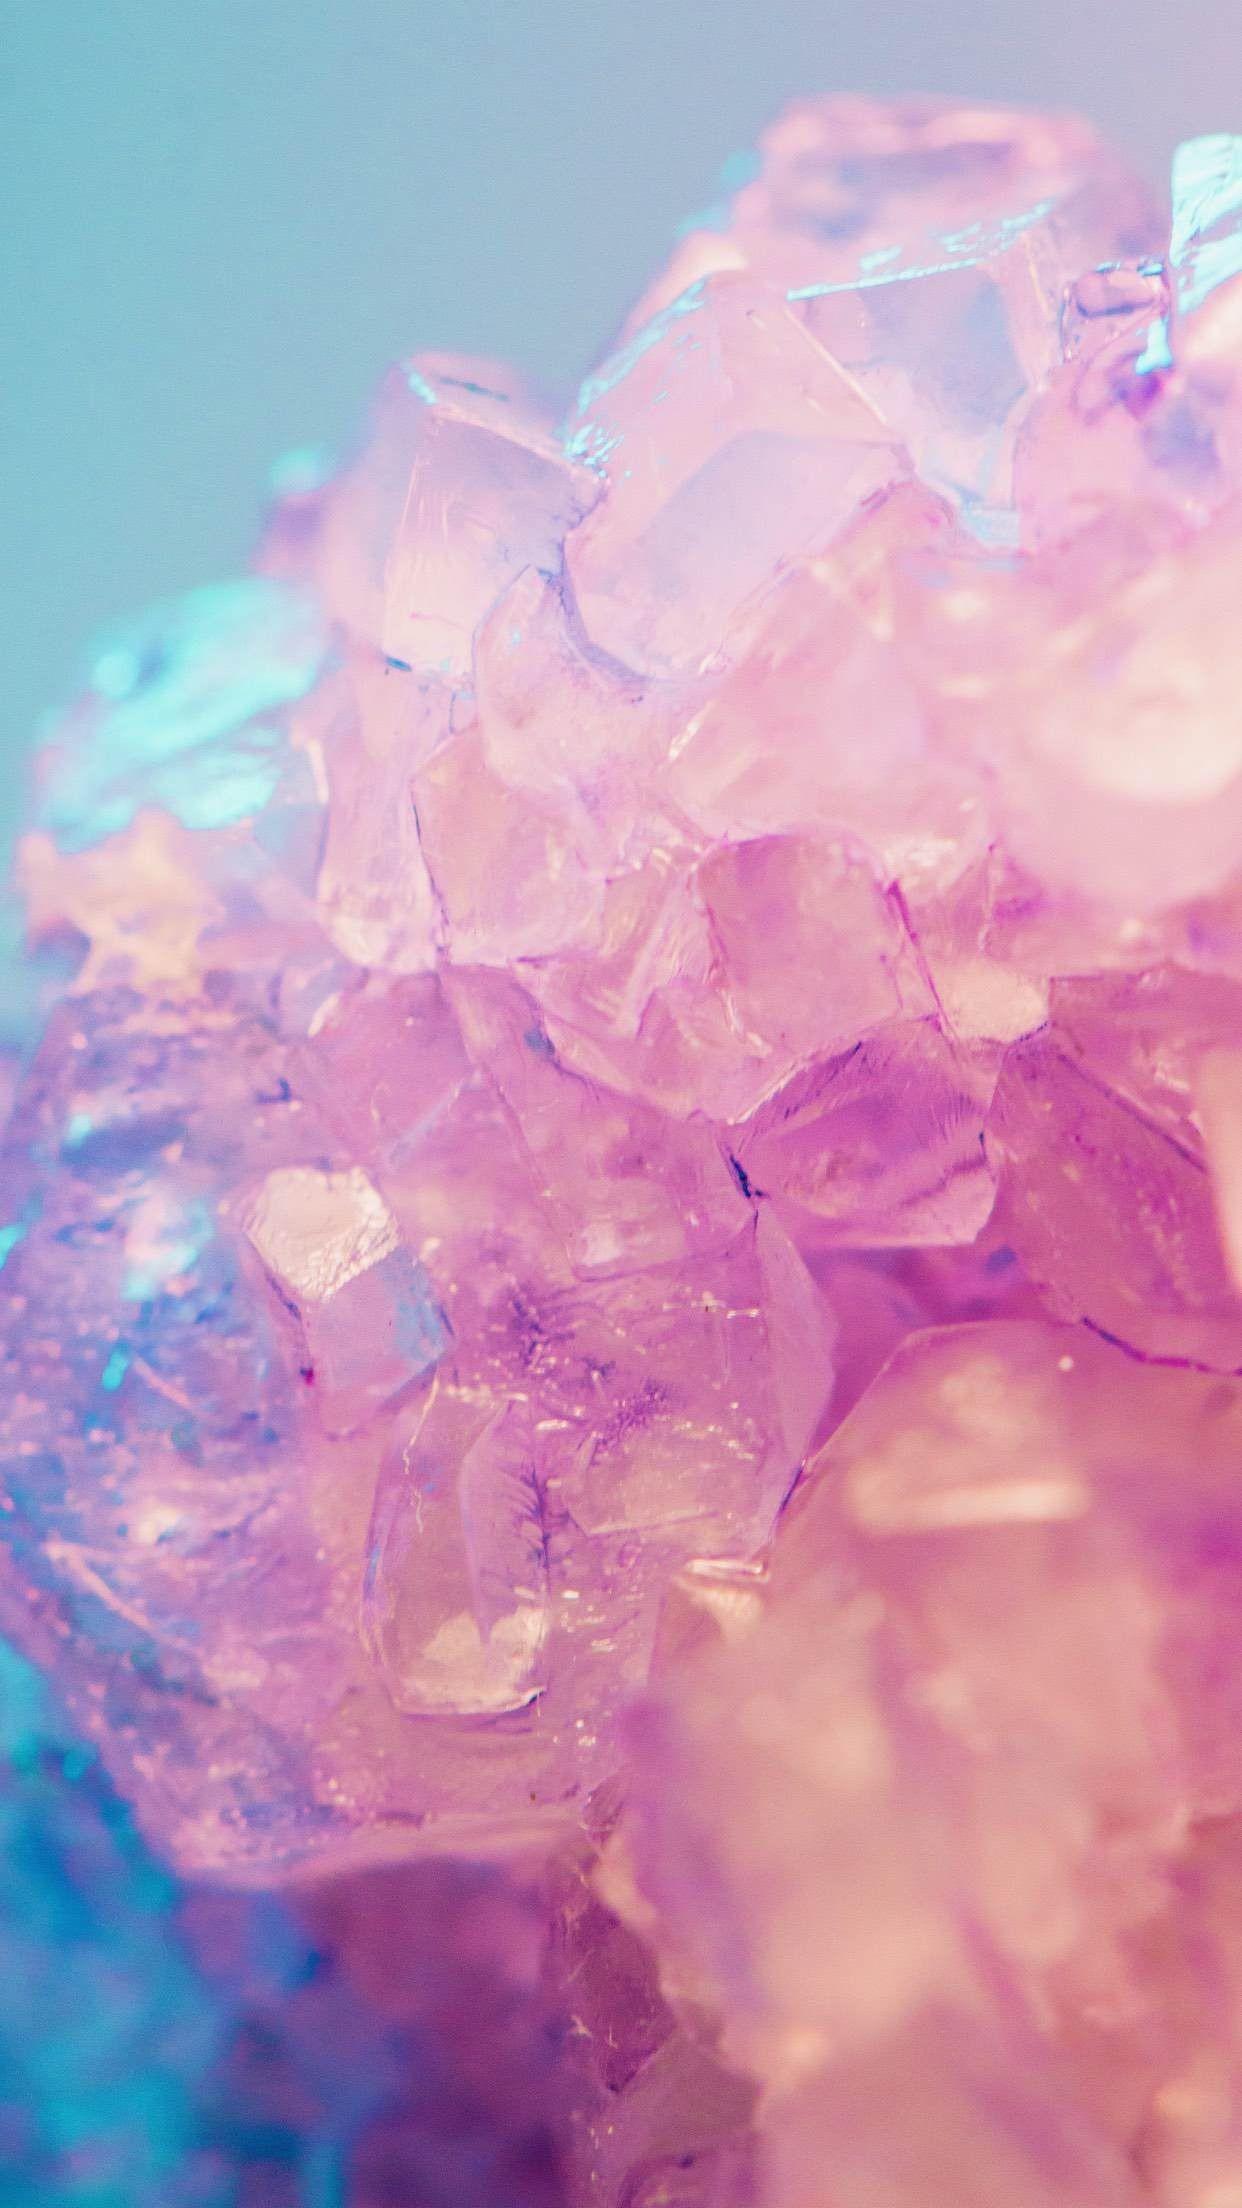 Crystals Wallpaper 63 Images